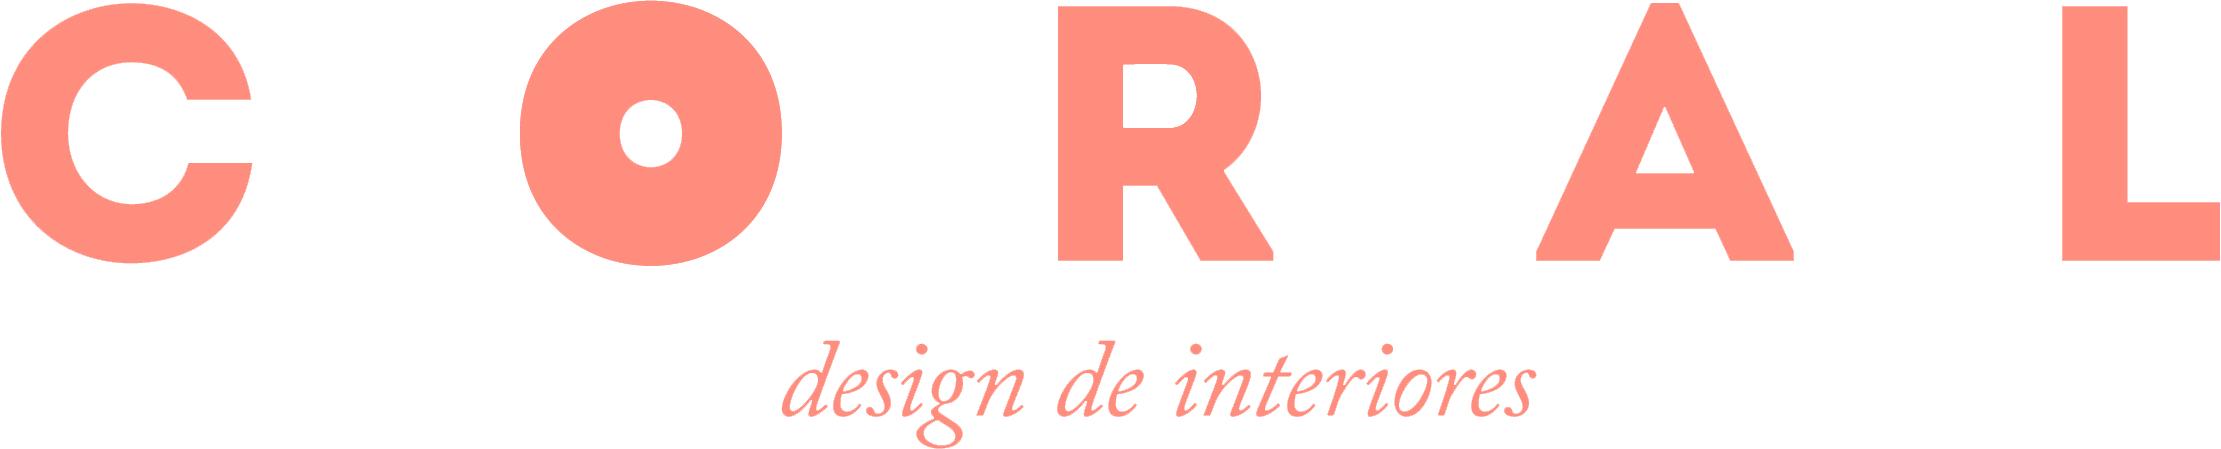 logo corslll